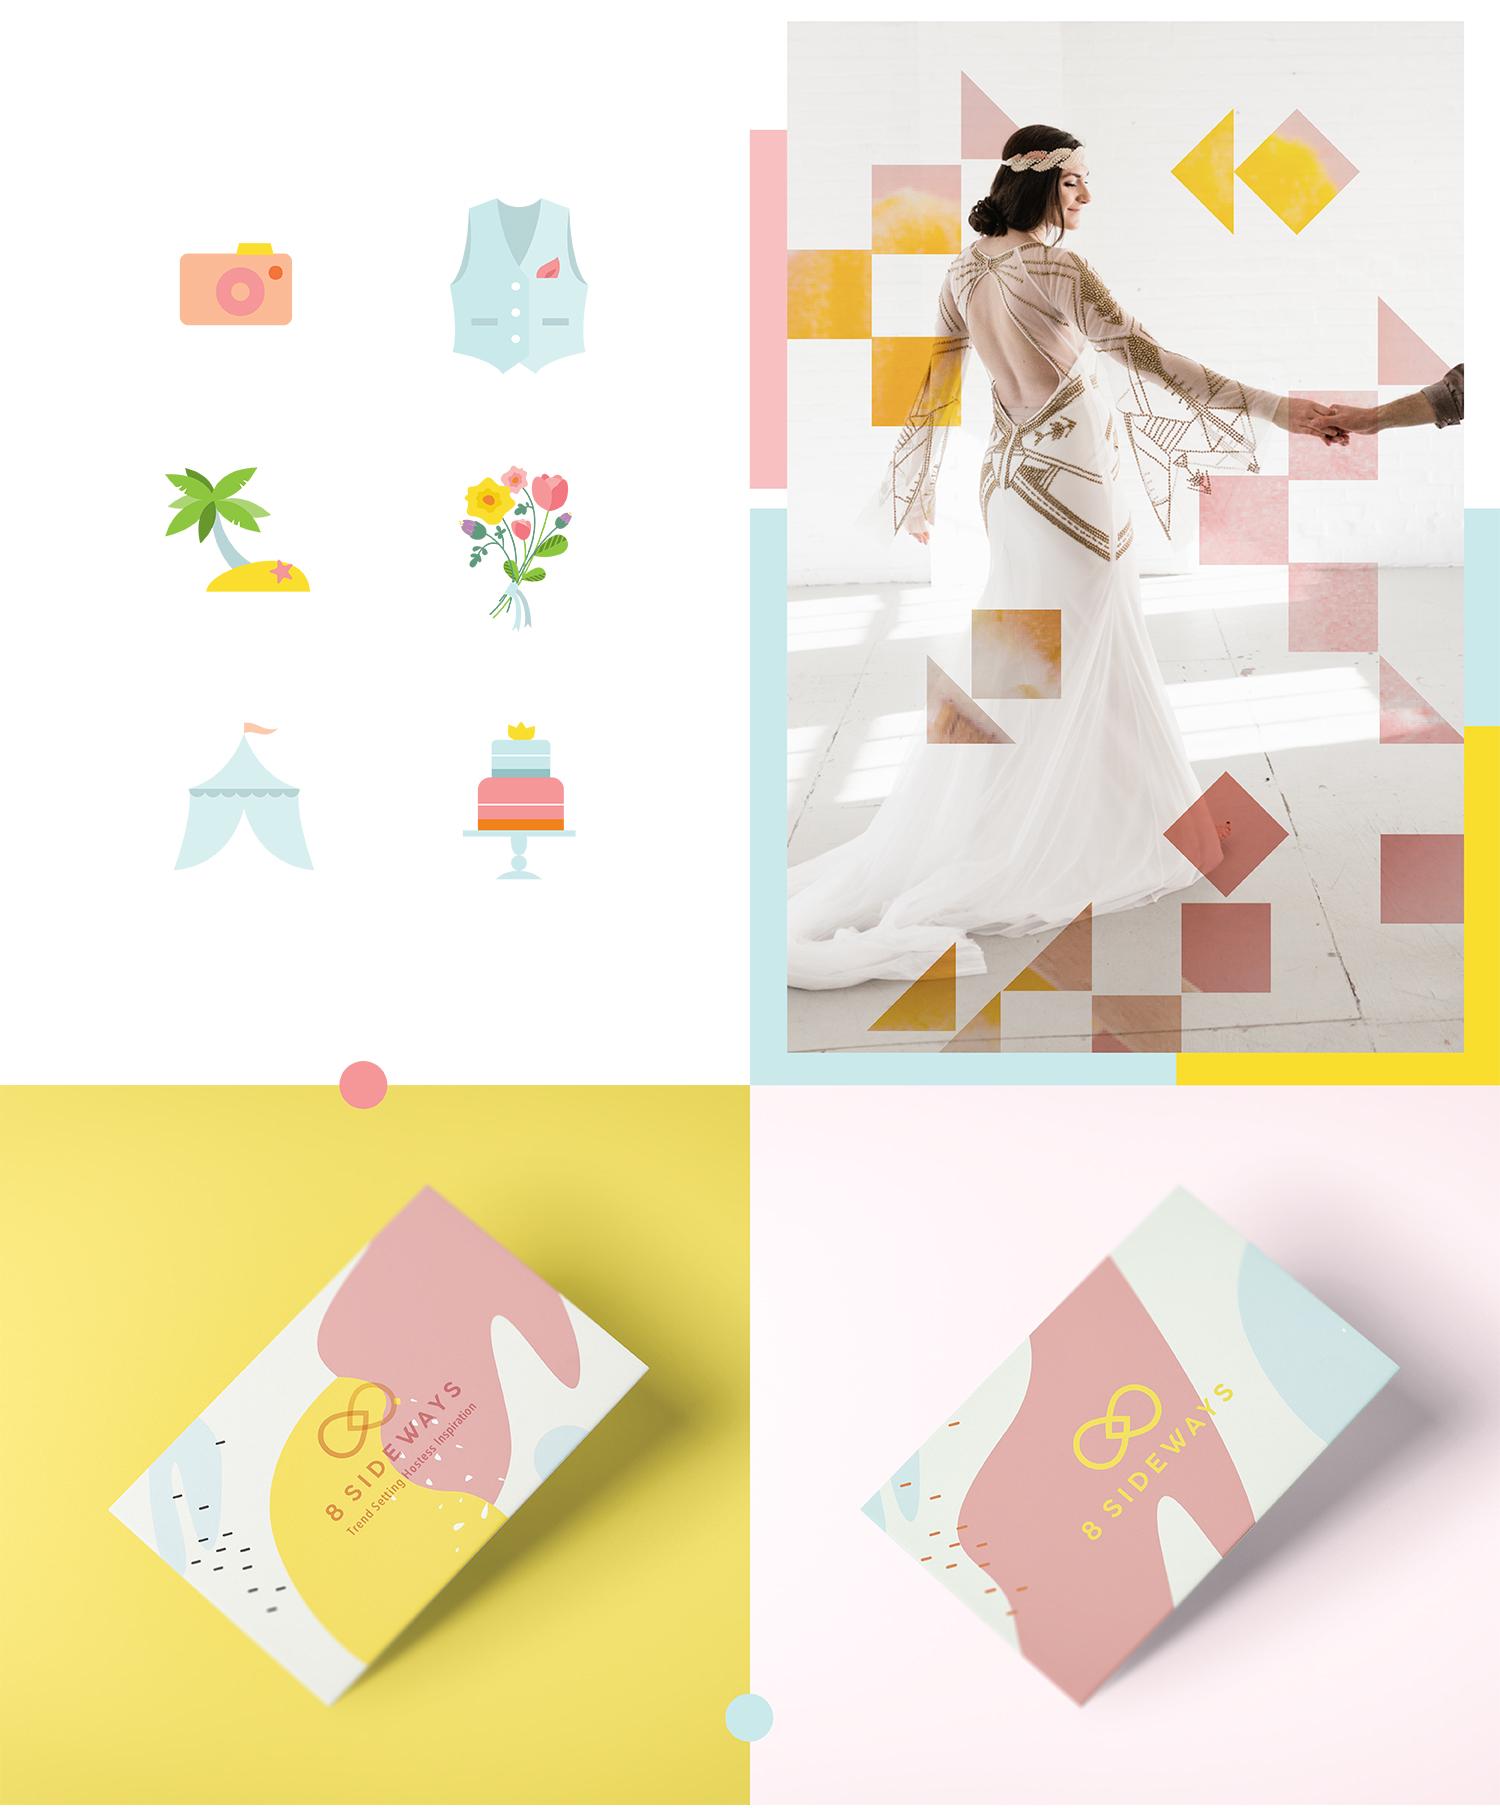 8-sideways-portfolio_04